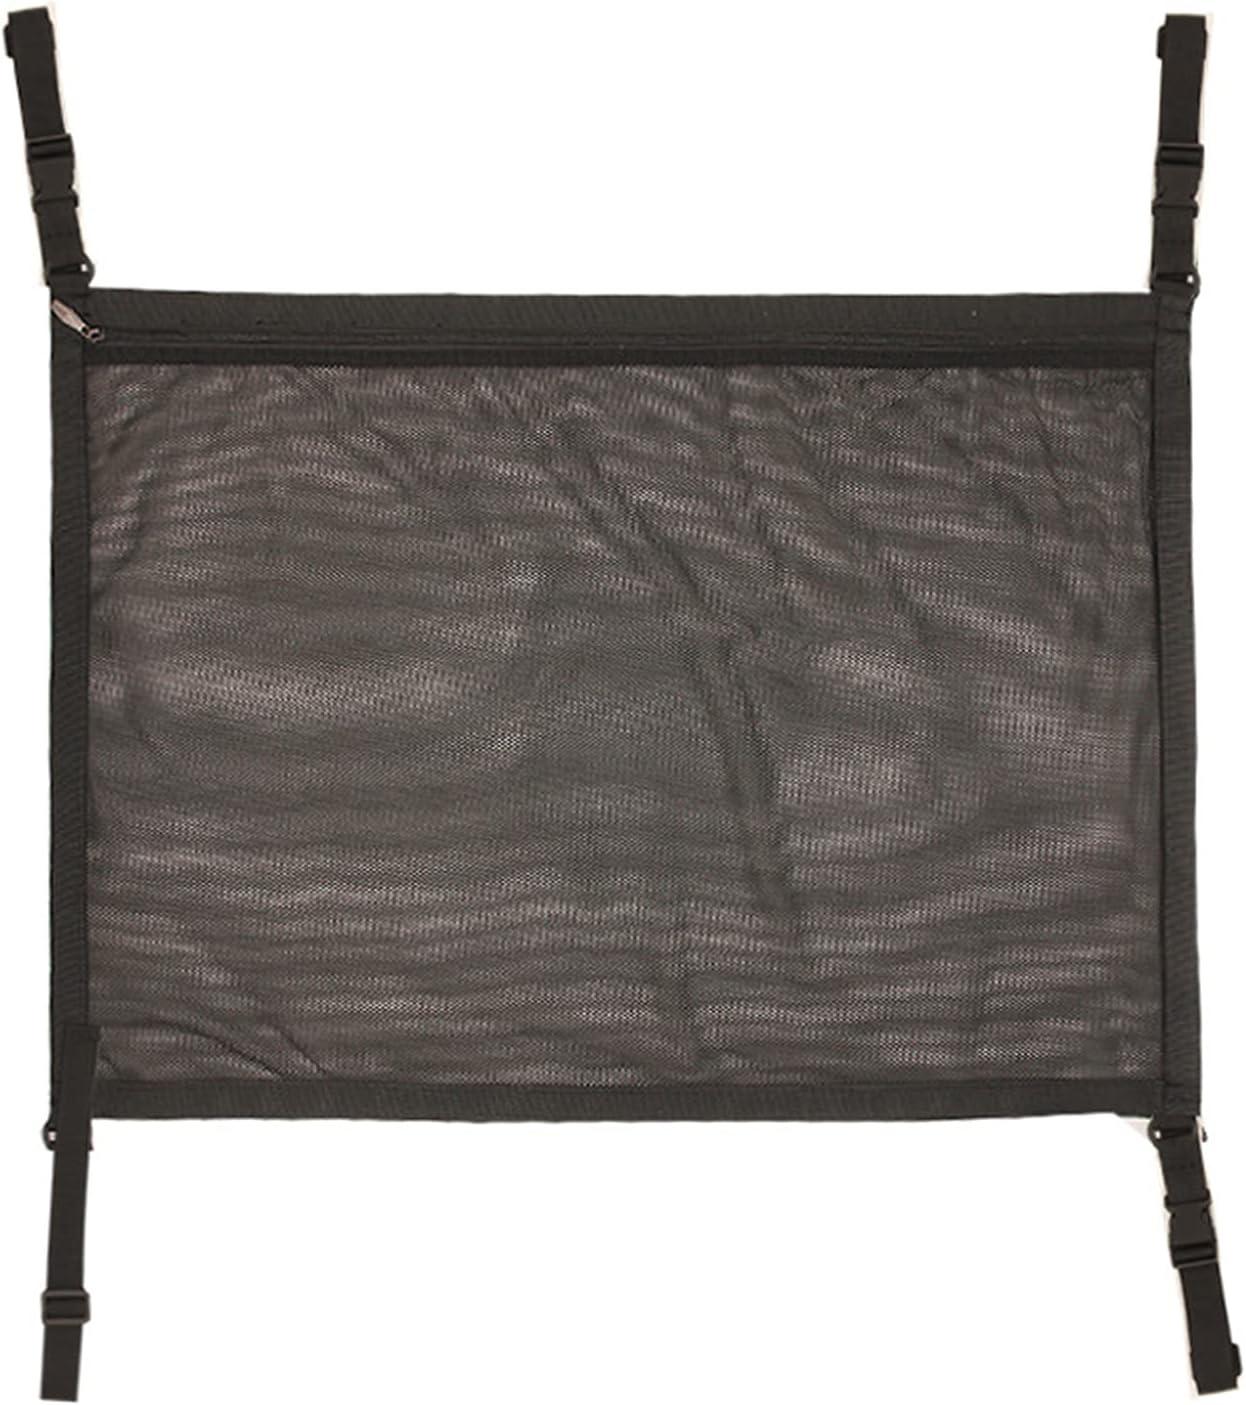 Decdeal Cargo Net Car Ceiling Pocket Very popular for Mod Fit Las Vegas Mall Most